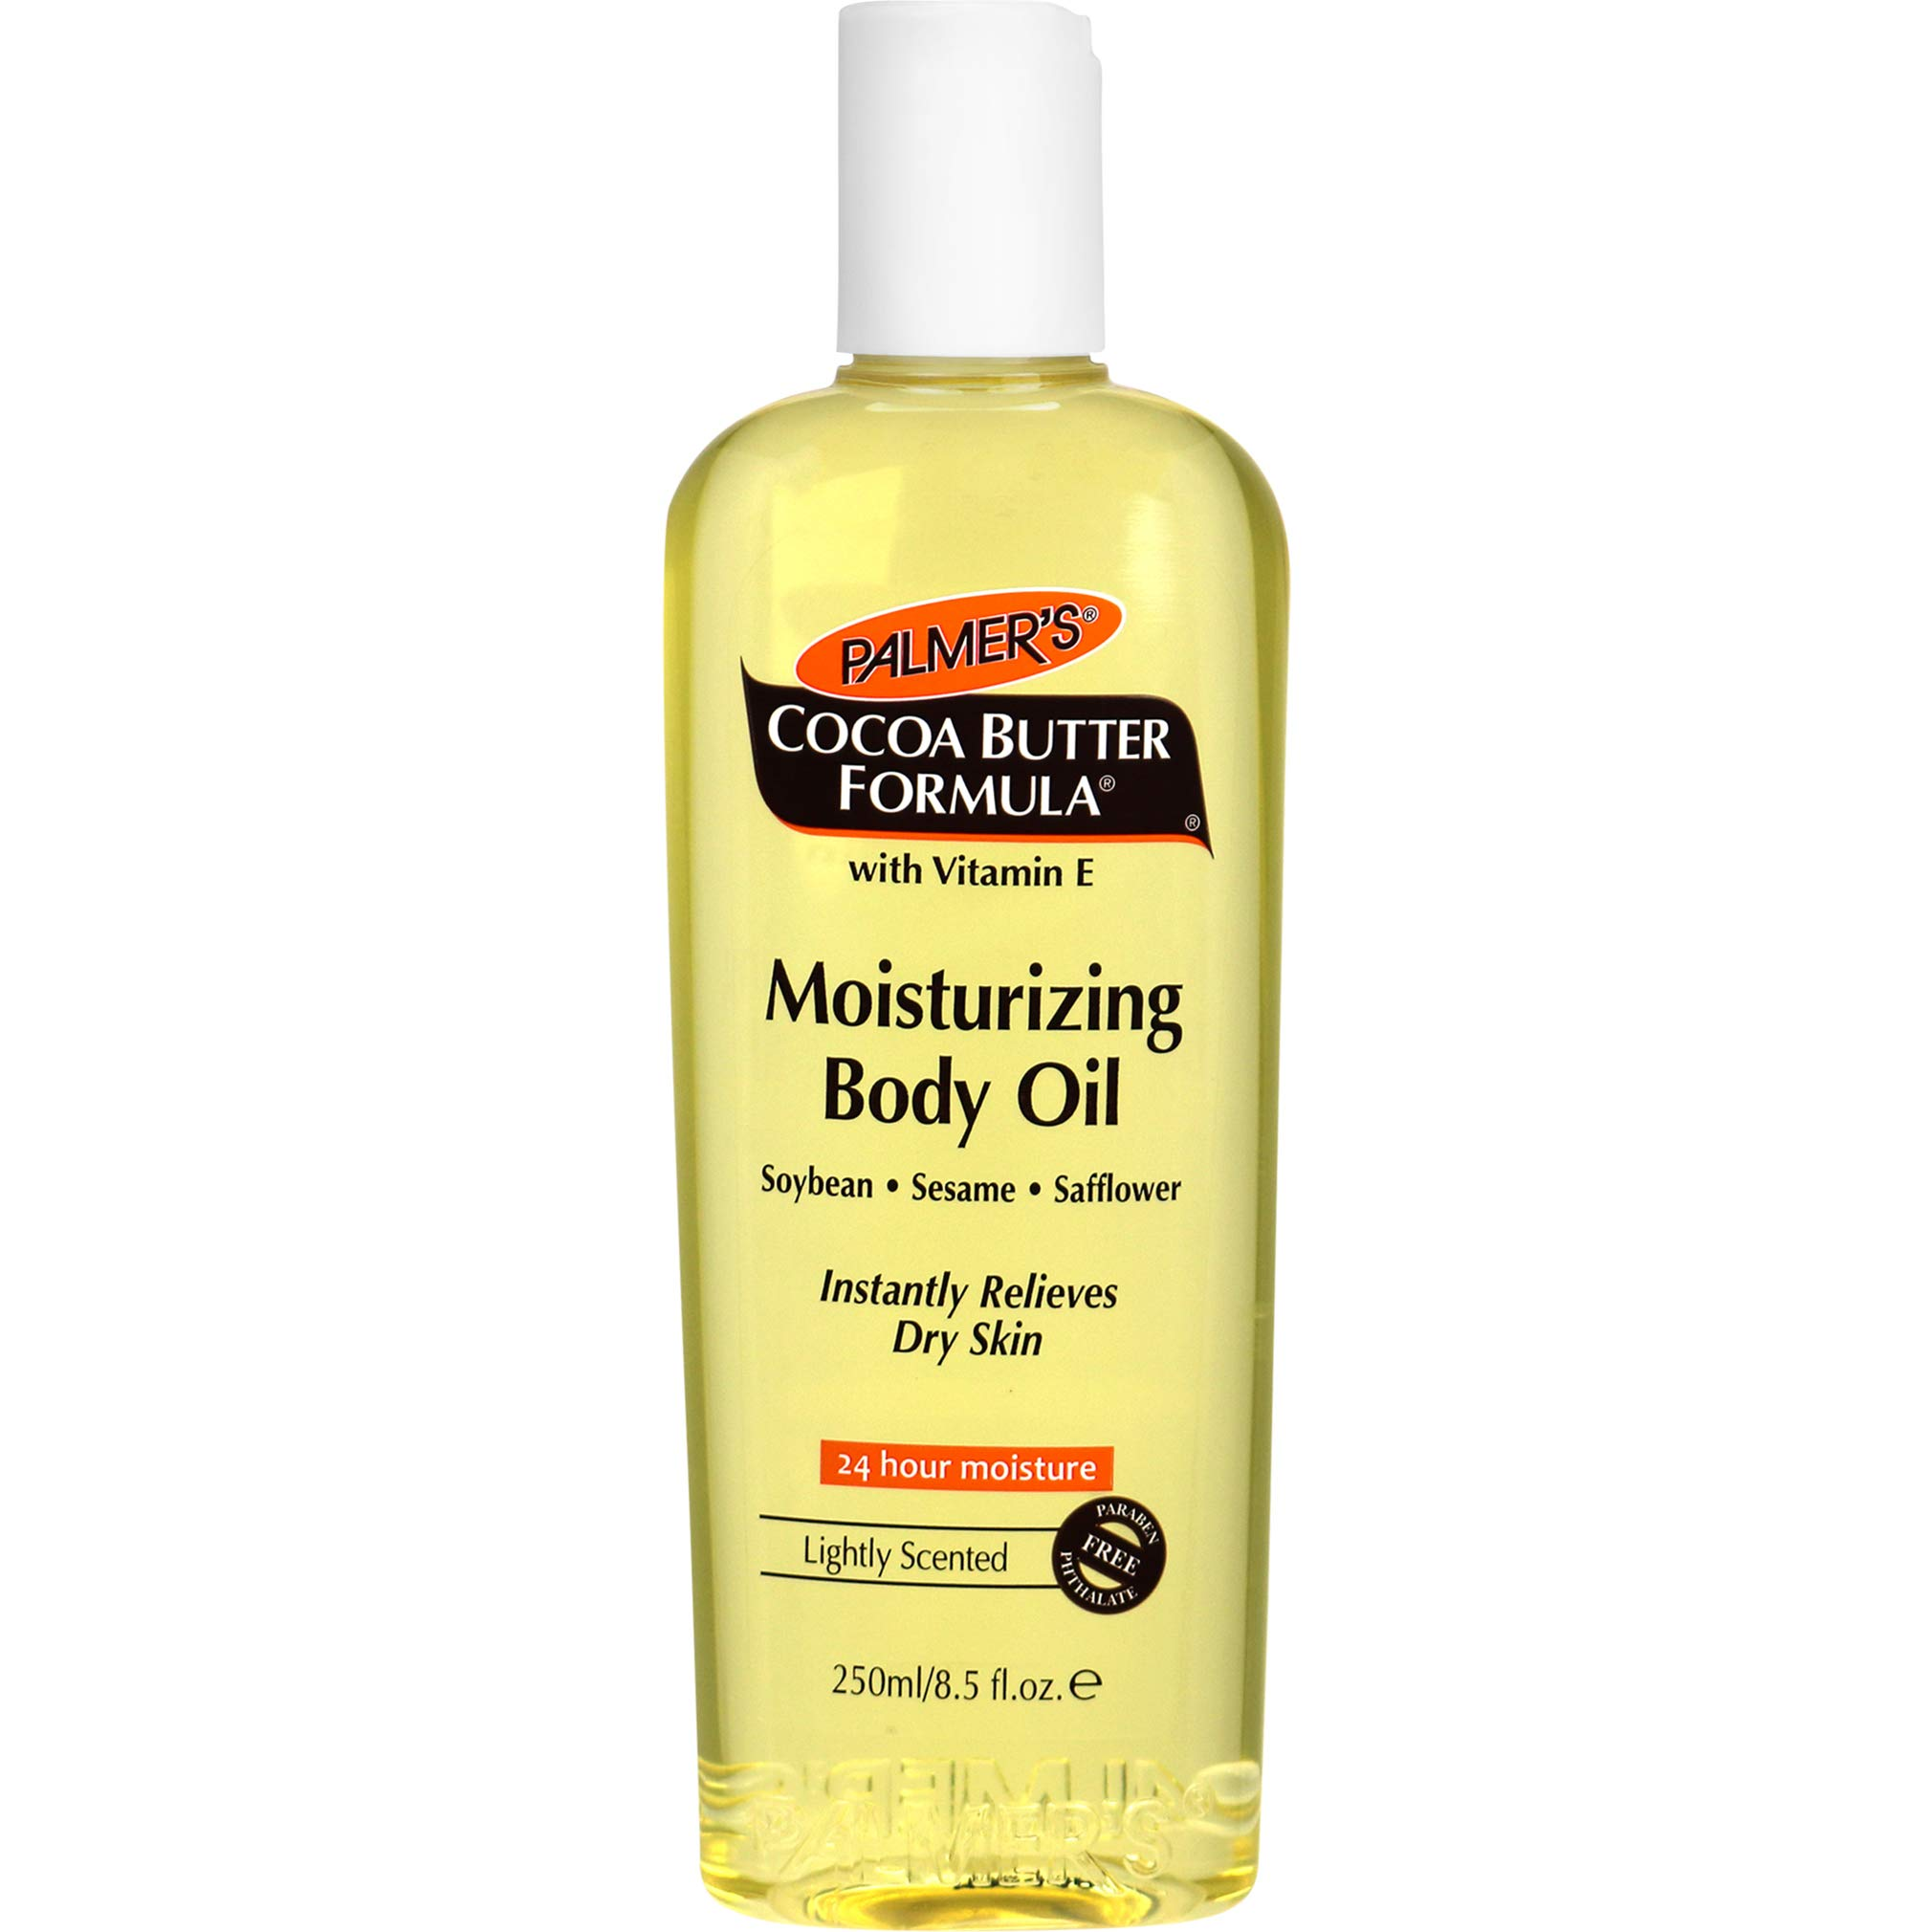 Palmer's Cocoa Butter Moisturizing Body Oil with Vitamin E, 8.5 Ounces